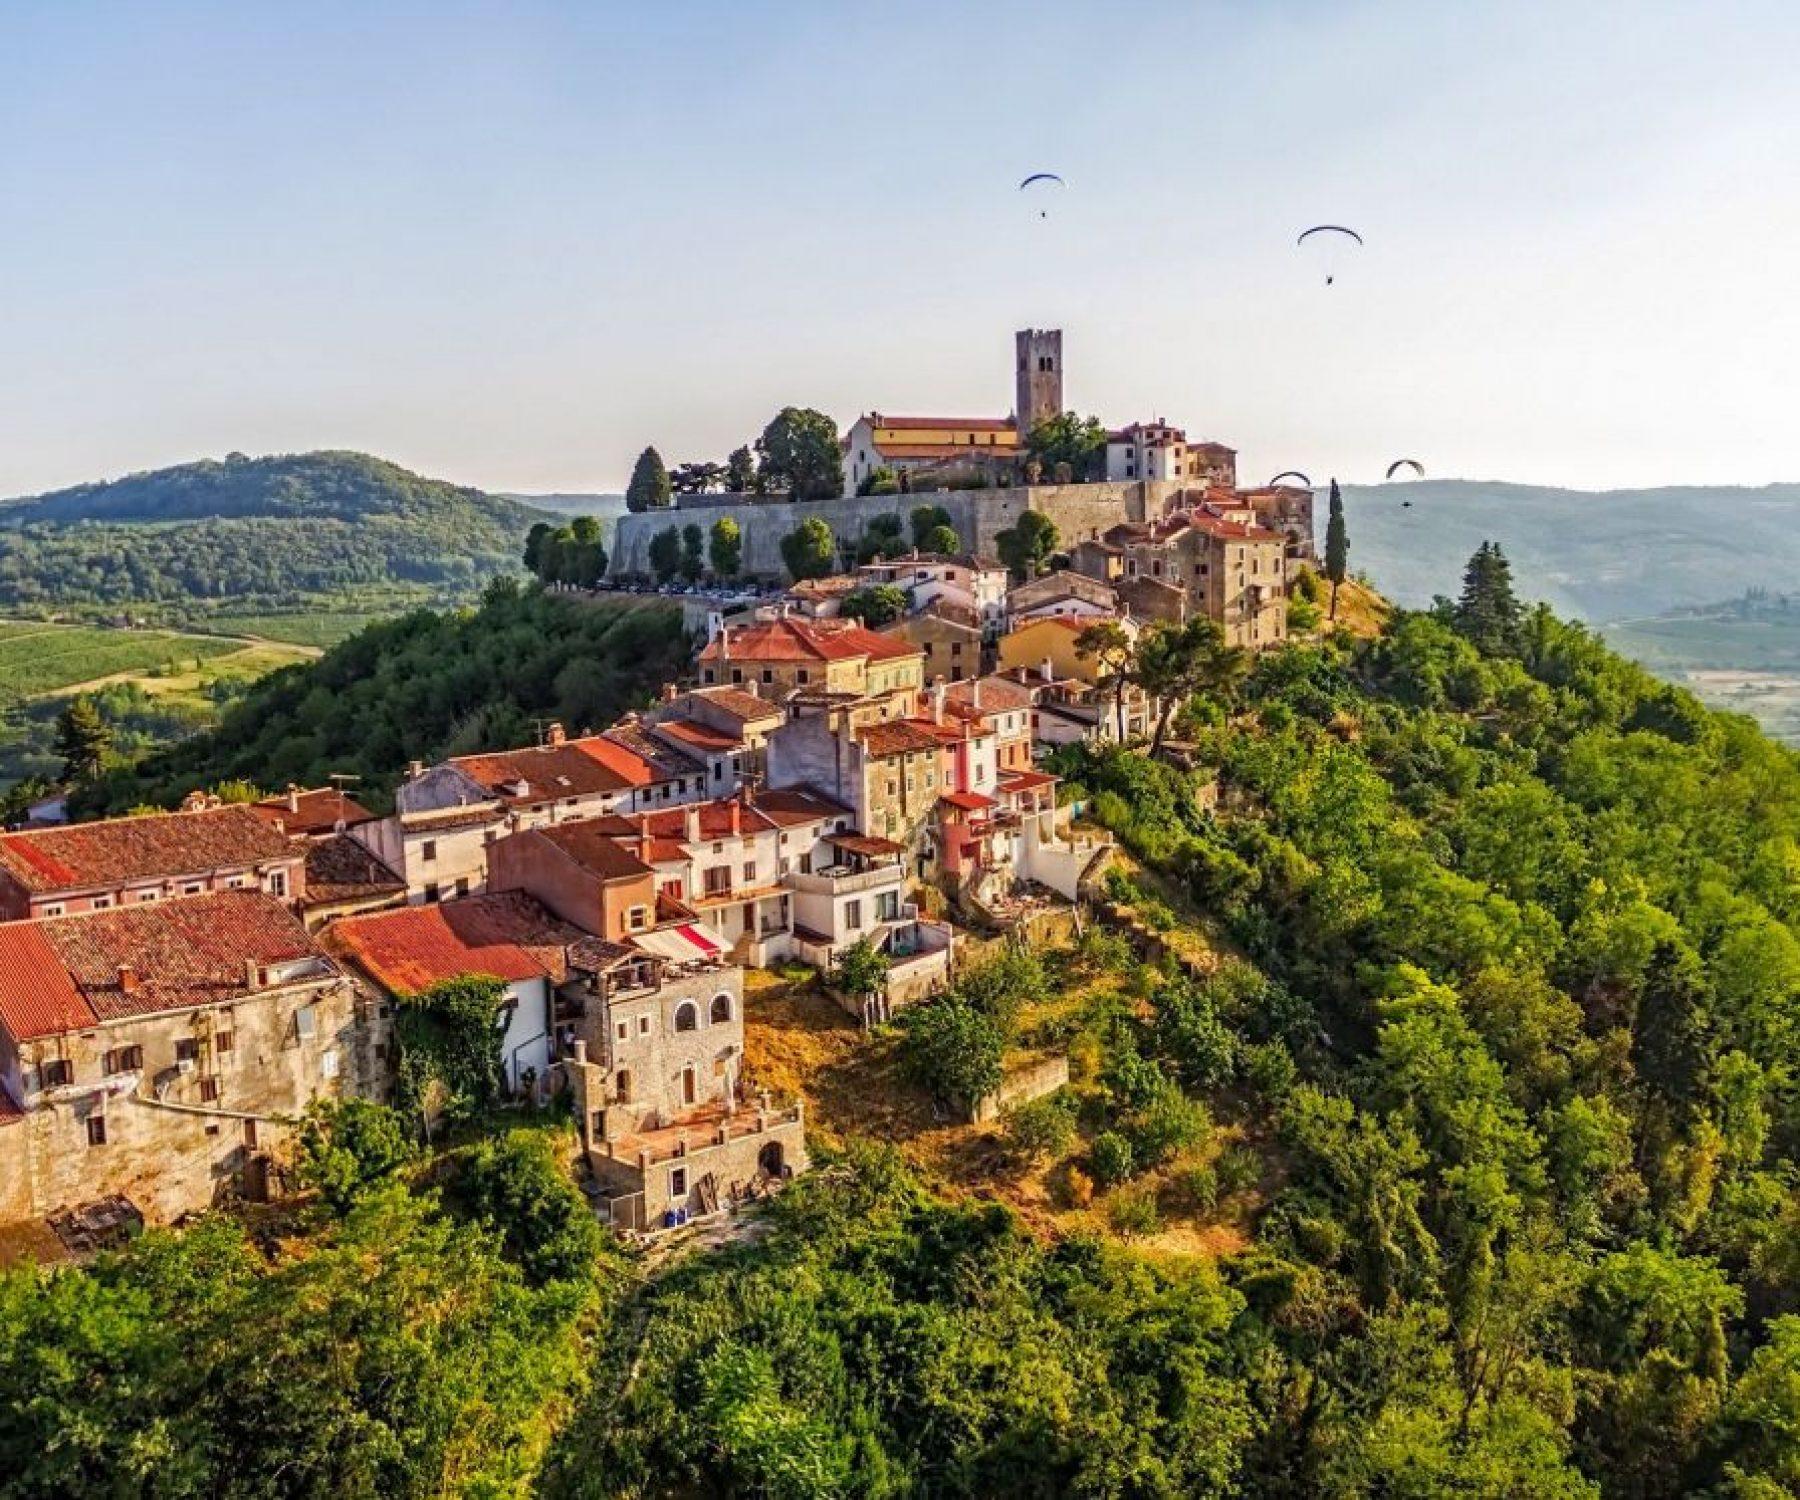 Croatia's top destinations in 2021